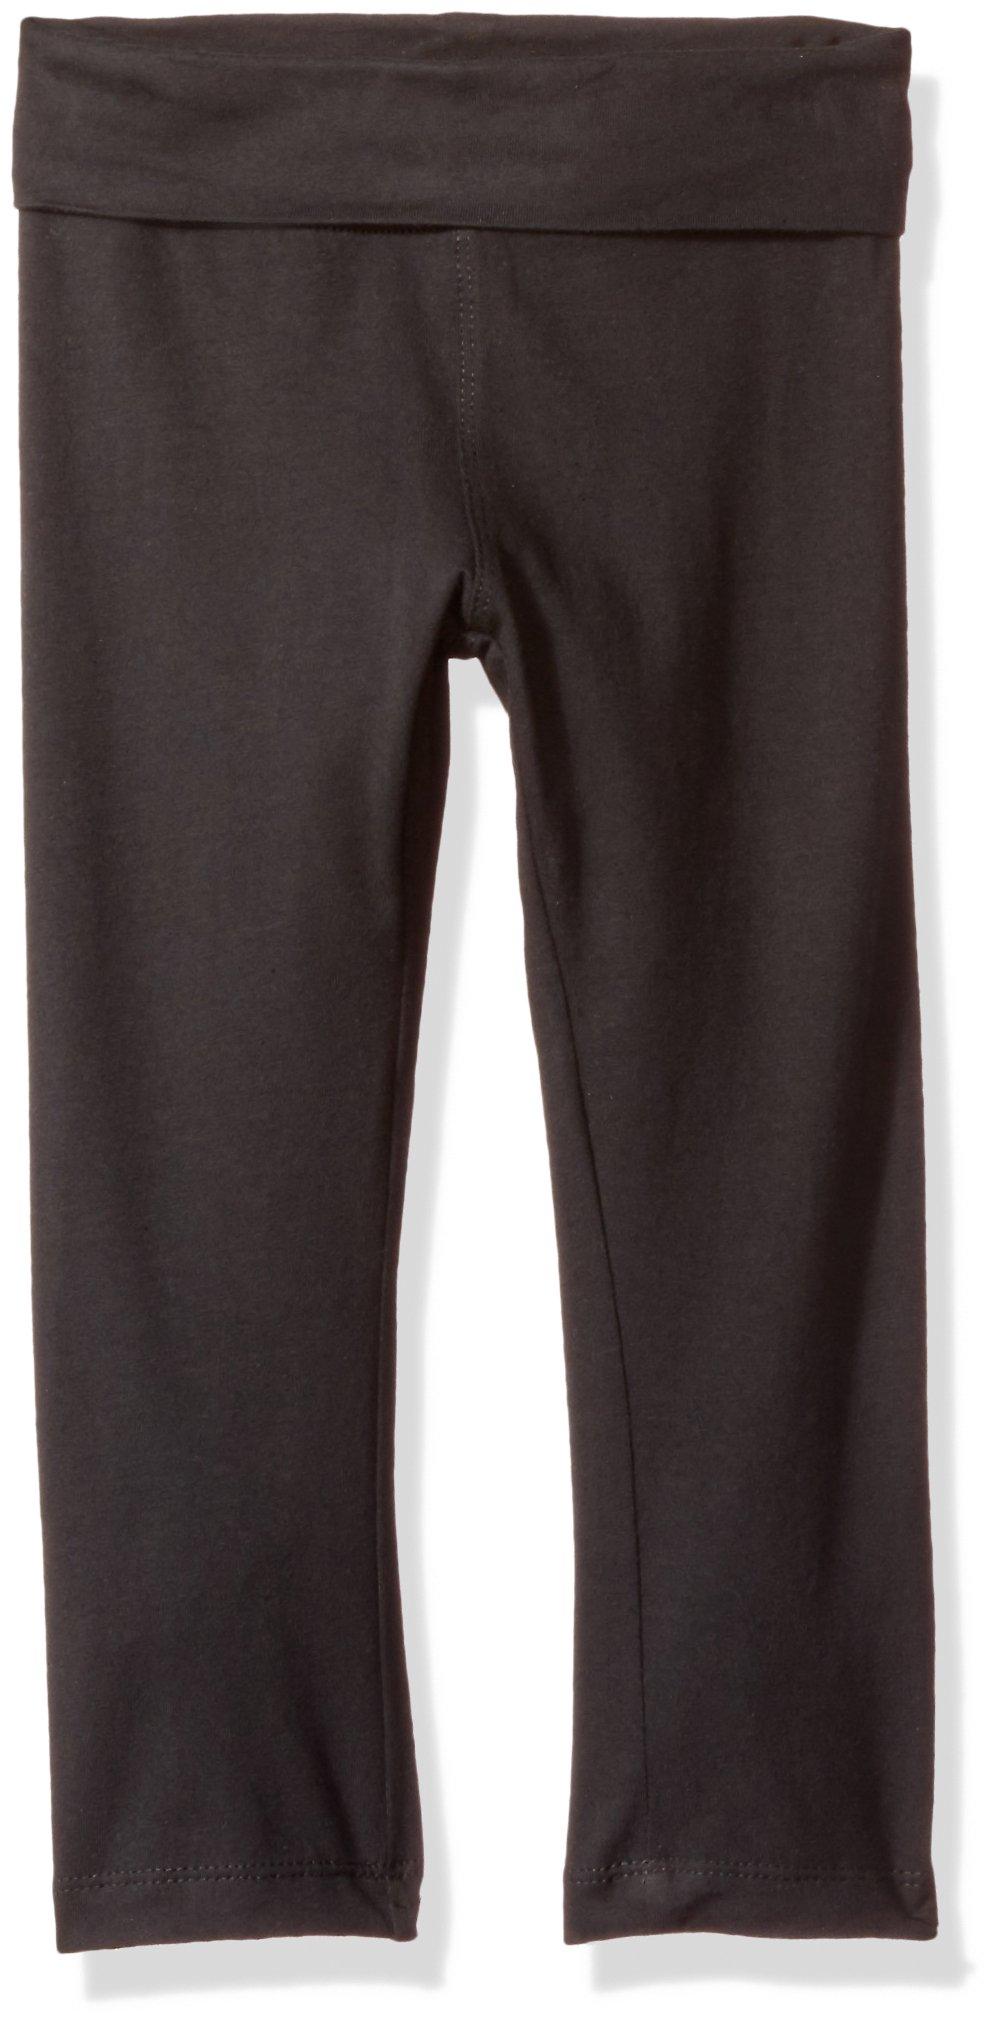 Clementine Apparel Big Girls' Yoga Pants, Black, 10